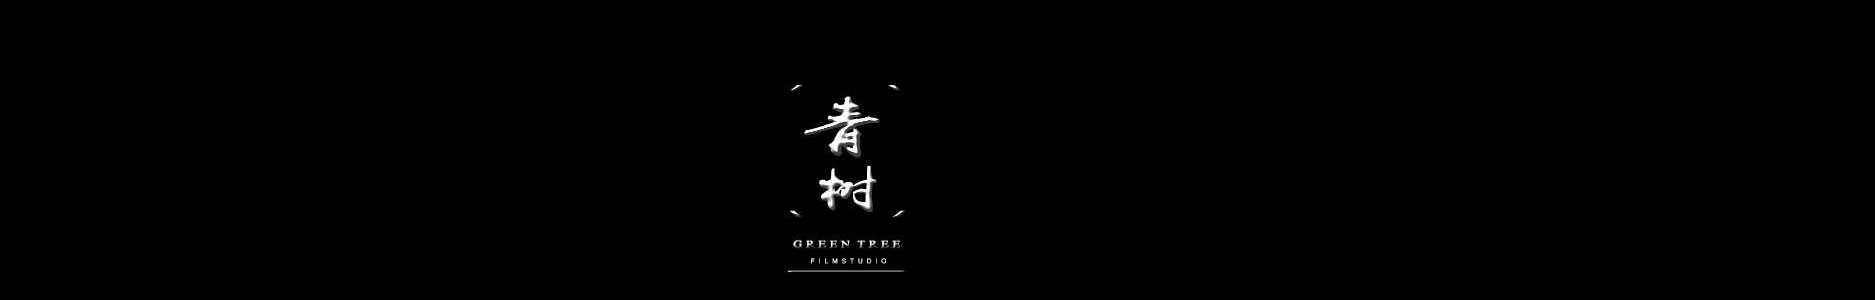 青树制片婚礼电影 banner